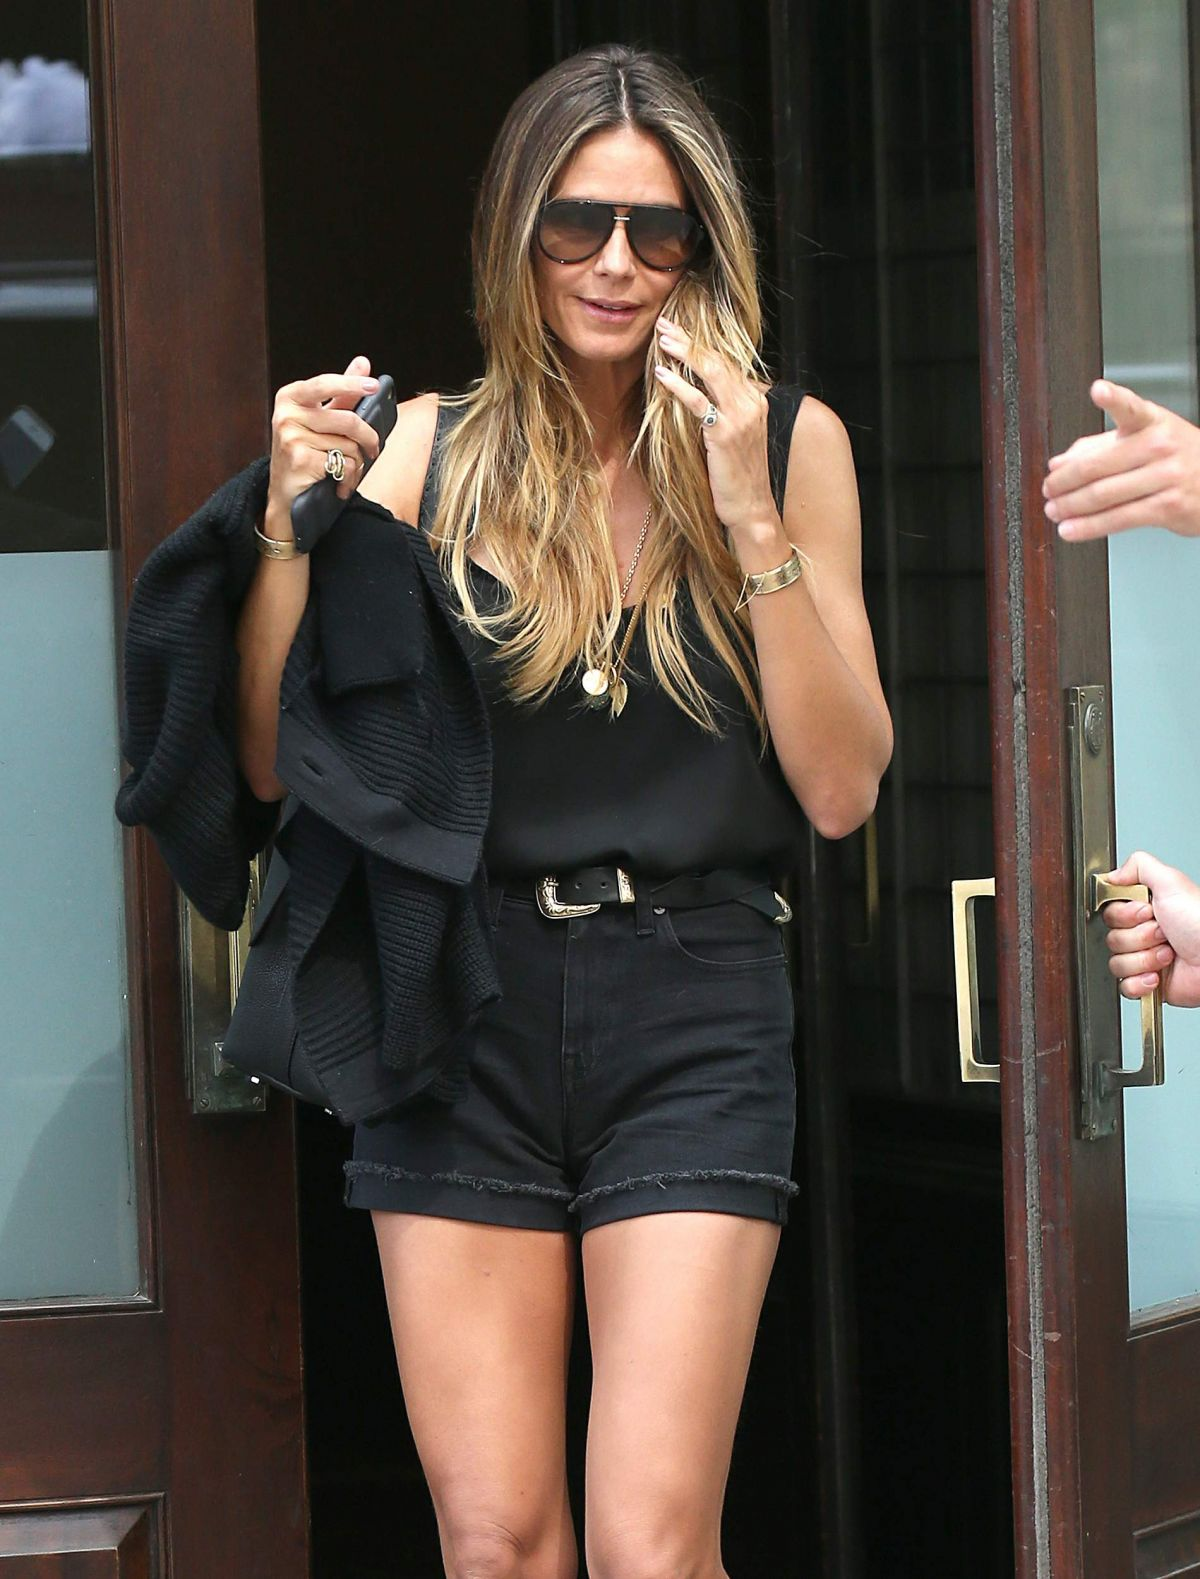 HEIDI KLUM in Shorts Leaves Her Hotel in New York 07/10/2017